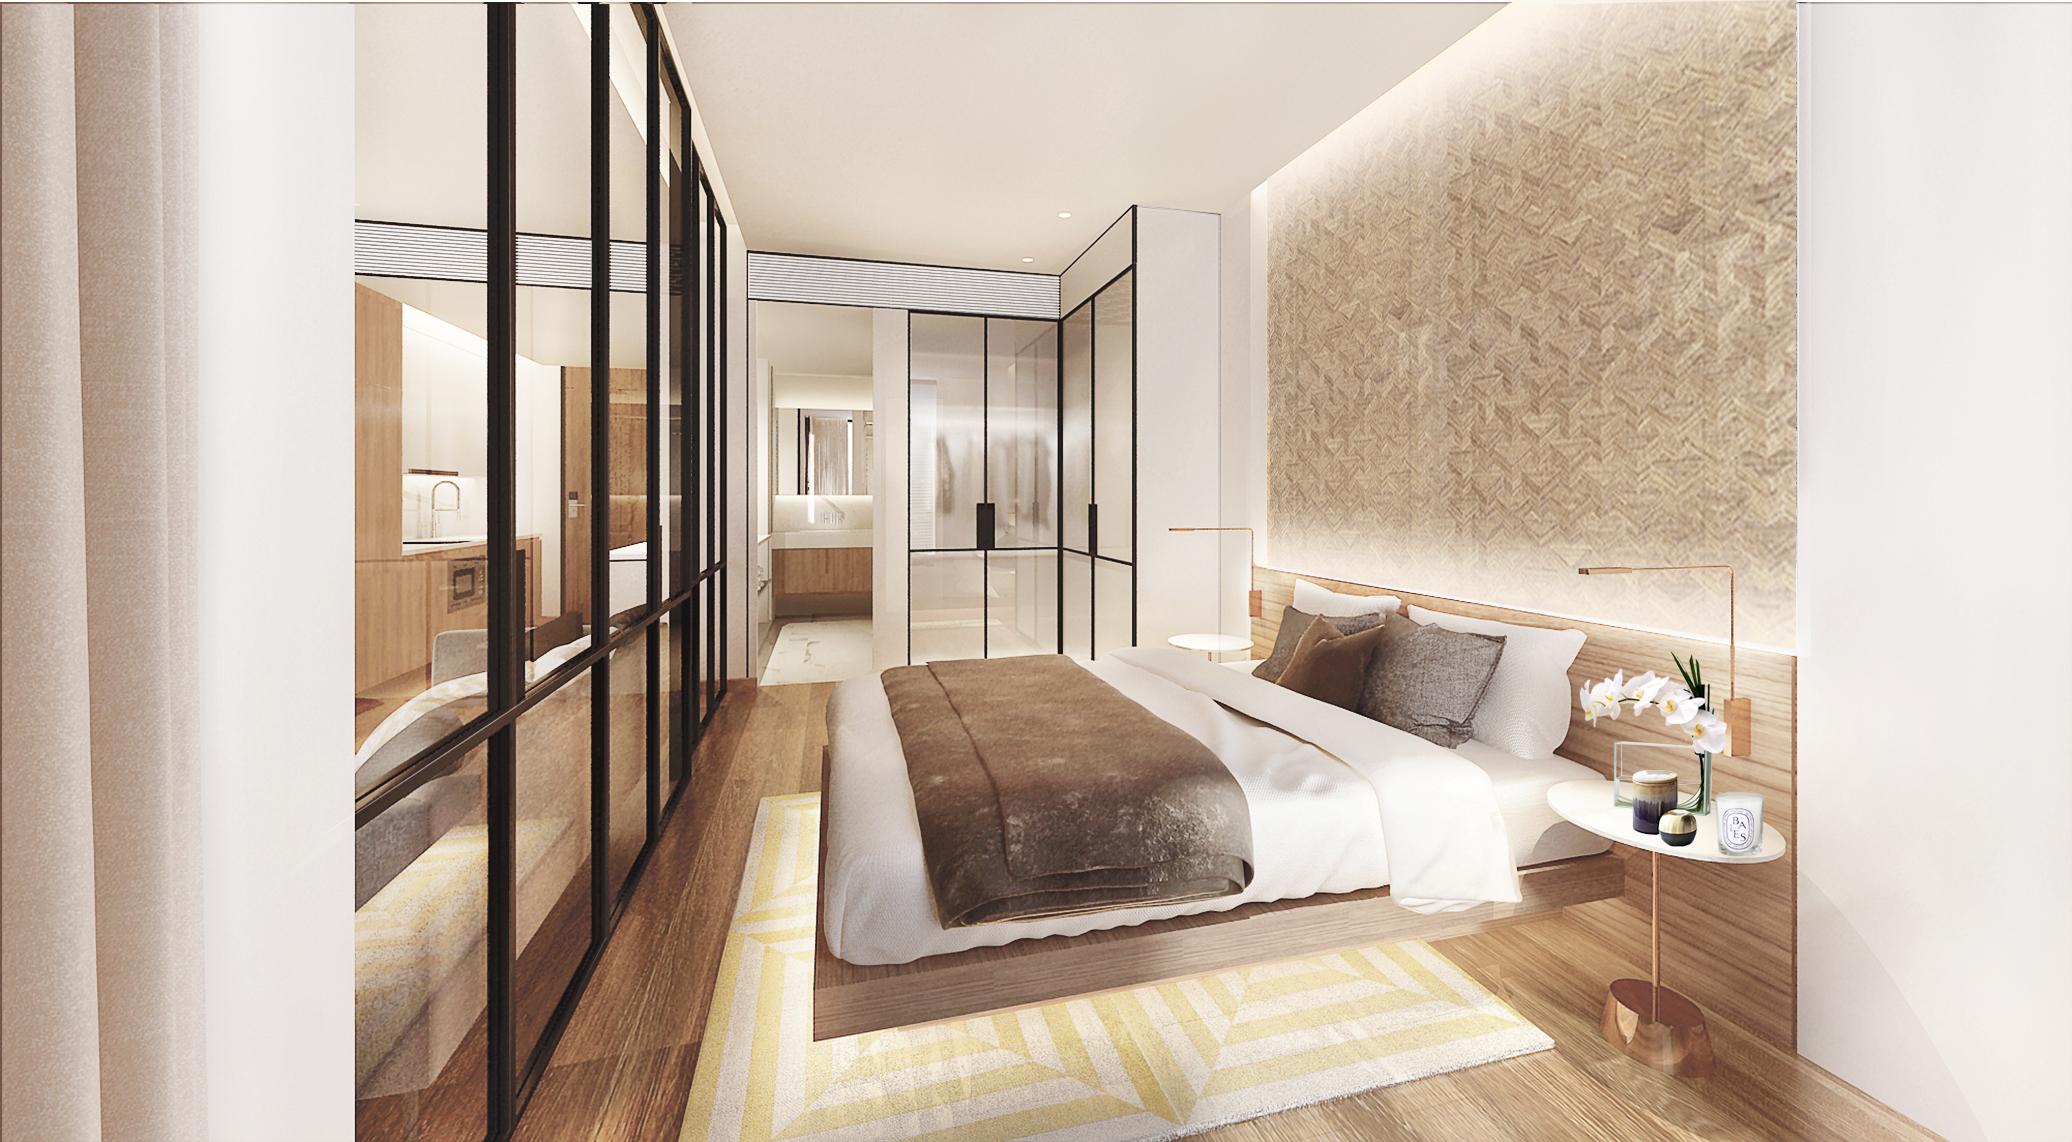 BOIFFILS-Muniq23-Pers-UNIT-42.5-04-Bedroom.jpg